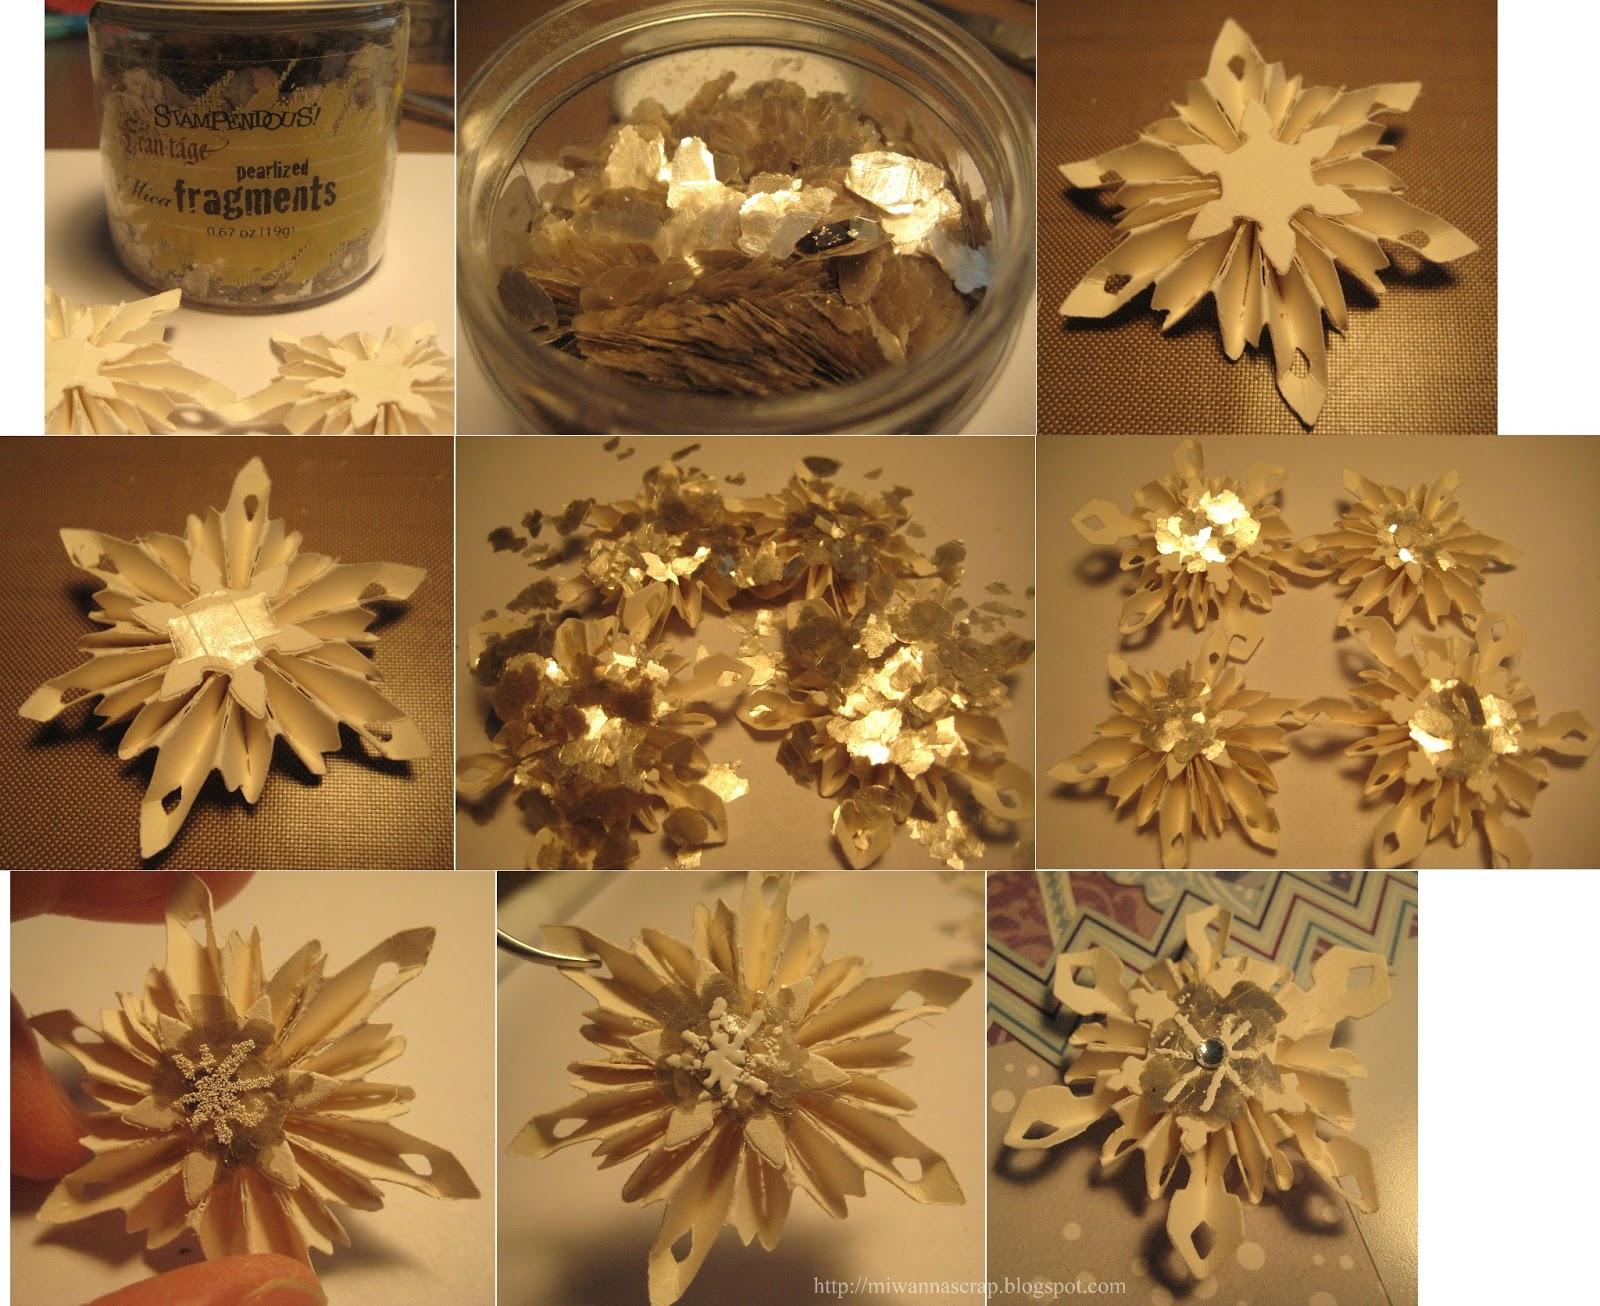 http://4.bp.blogspot.com/-dY23uRGpA_8/UPggjr-o4UI/AAAAAAAAC9M/H8GMTX41WqE/s1600/Step+7+-+Making+Mica+Snowflakes.jpg